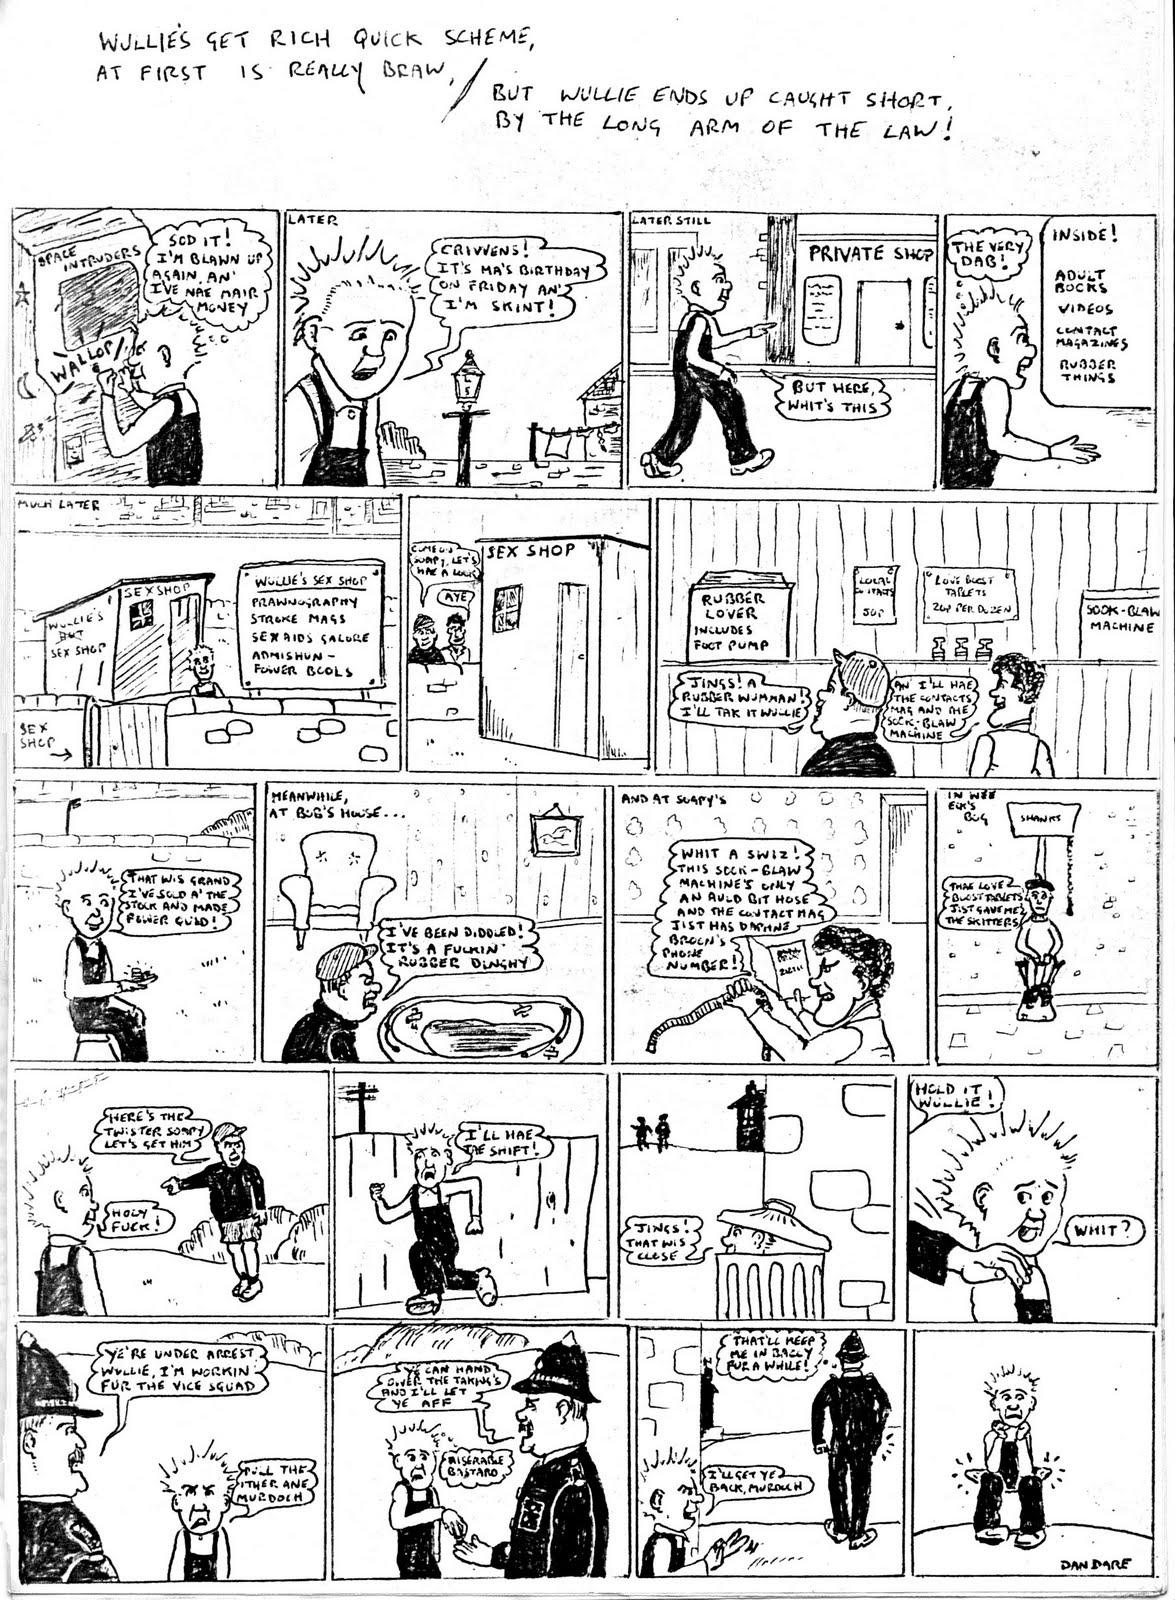 Retro Dundee Christmas Crackers Fanzine - 1980S-9712